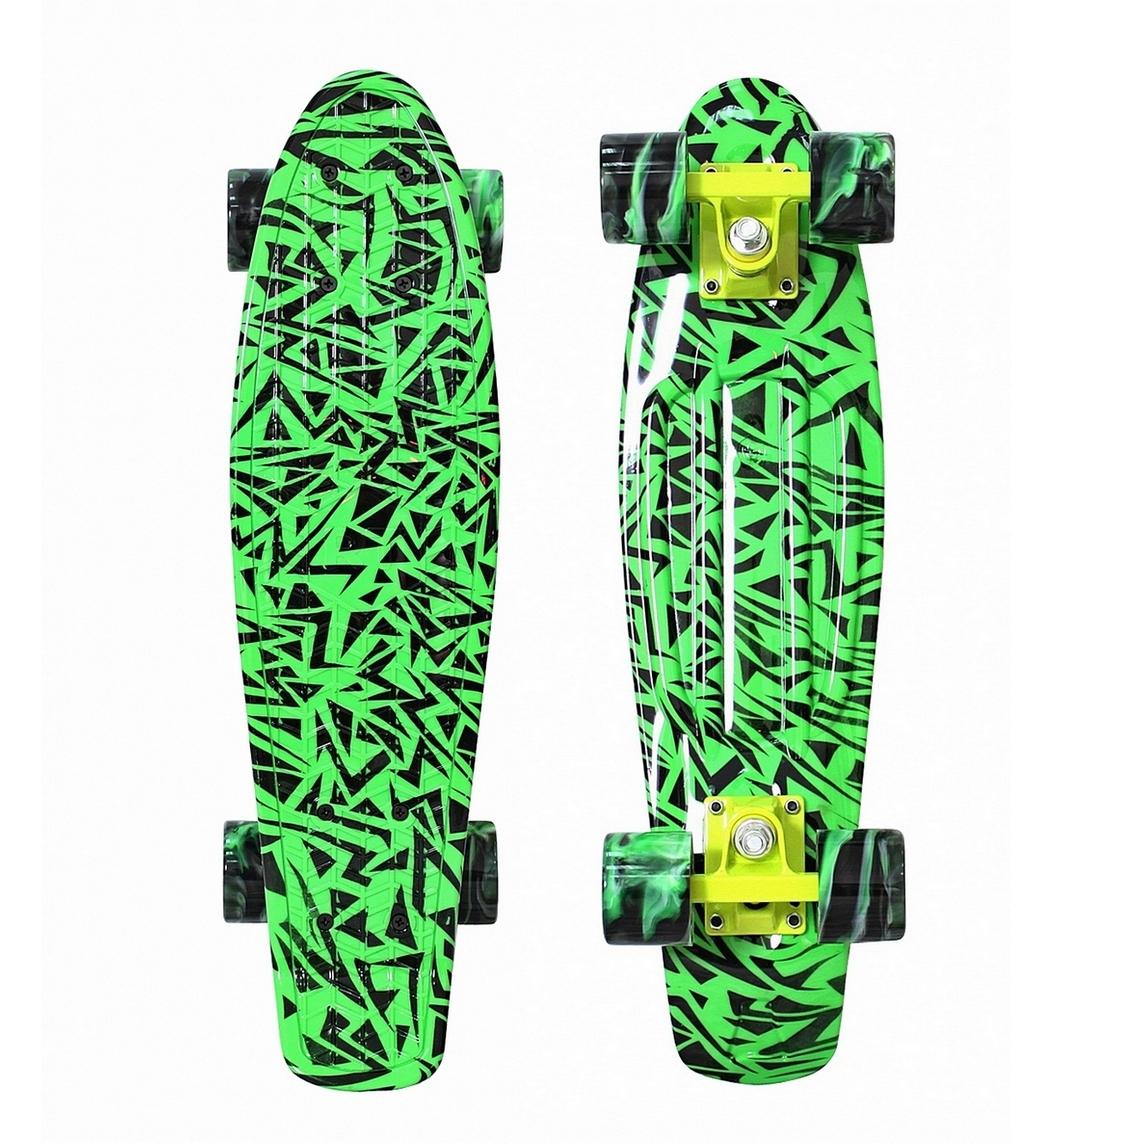 ��������� Y-Scoo Penny board Print Green Elka